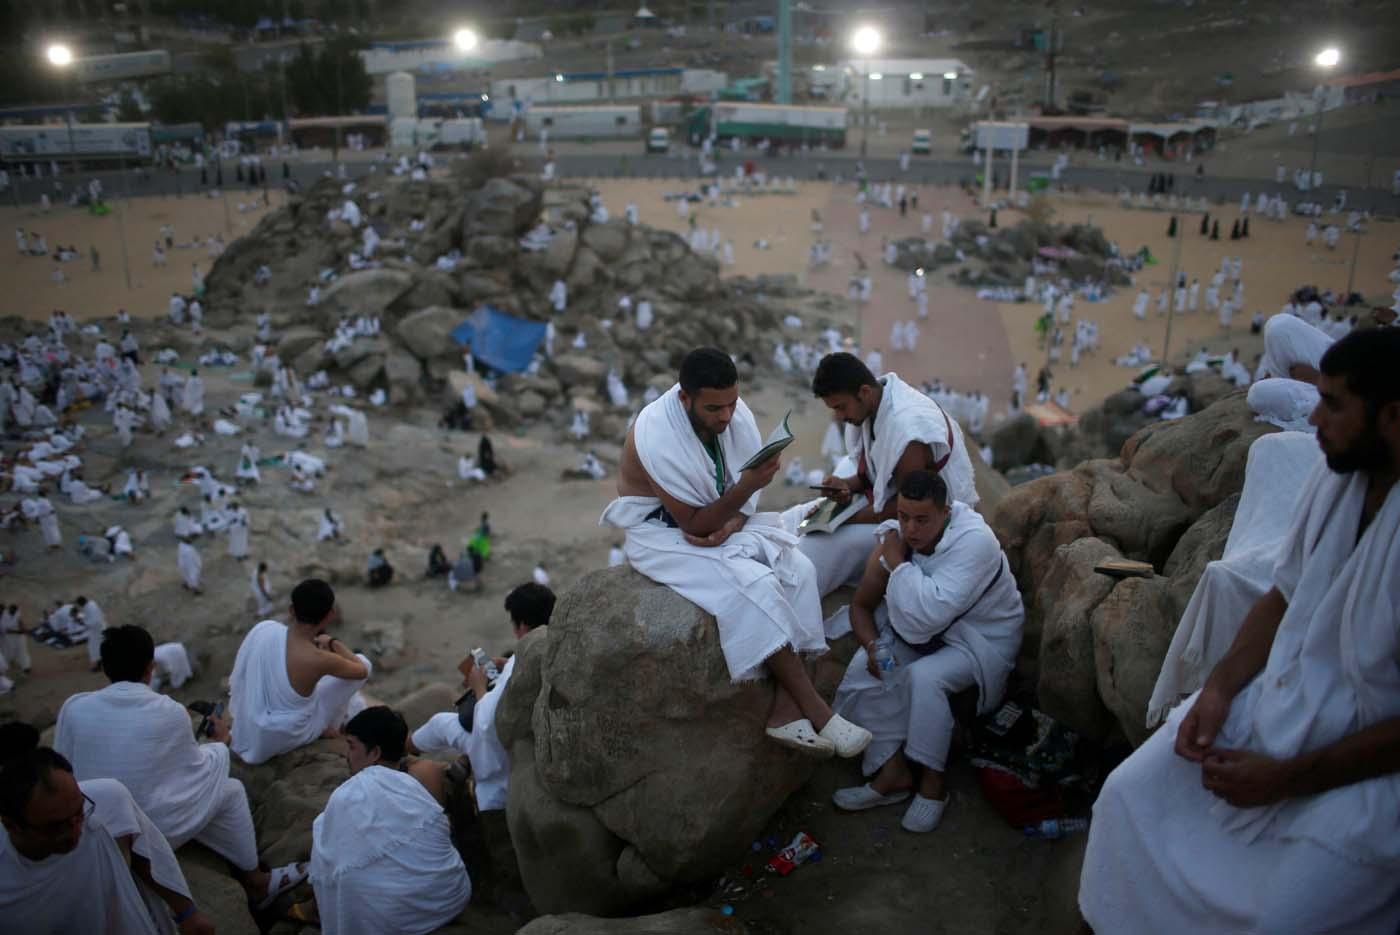 Muslim pilgrims gather on Mount Mercy on the plains of Arafat during the annual haj pilgrimage, outside the holy city of Mecca, Saudi Arabia August 31, 2017.  REUTERS/Suhaib Salem